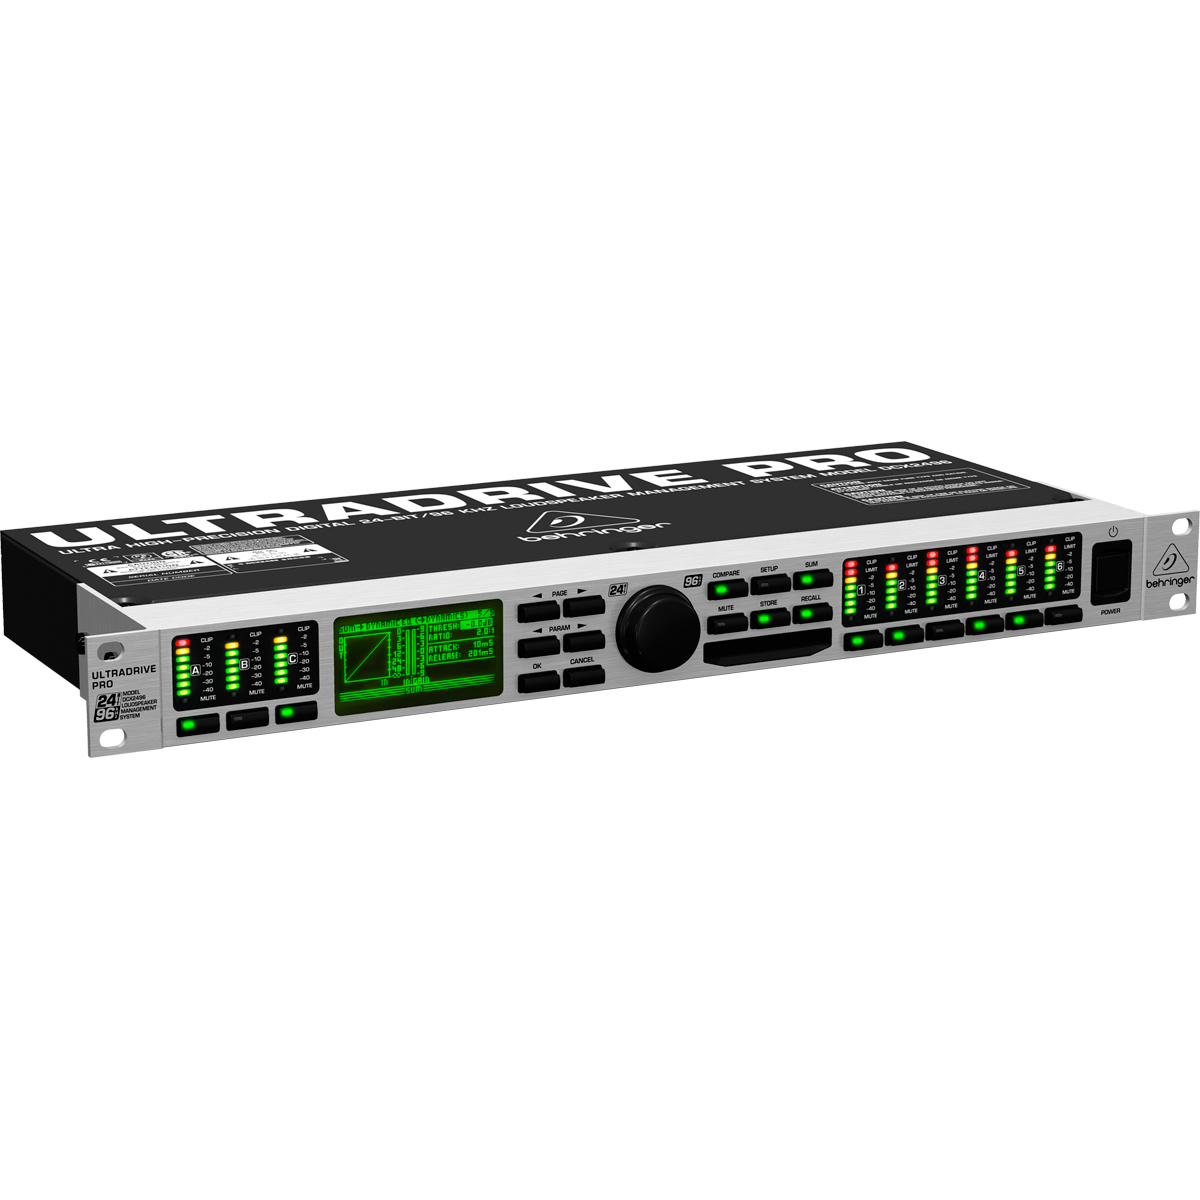 DCX2496 - Processador de �udio Ultradrive PRO DCX 2496 - Behringer